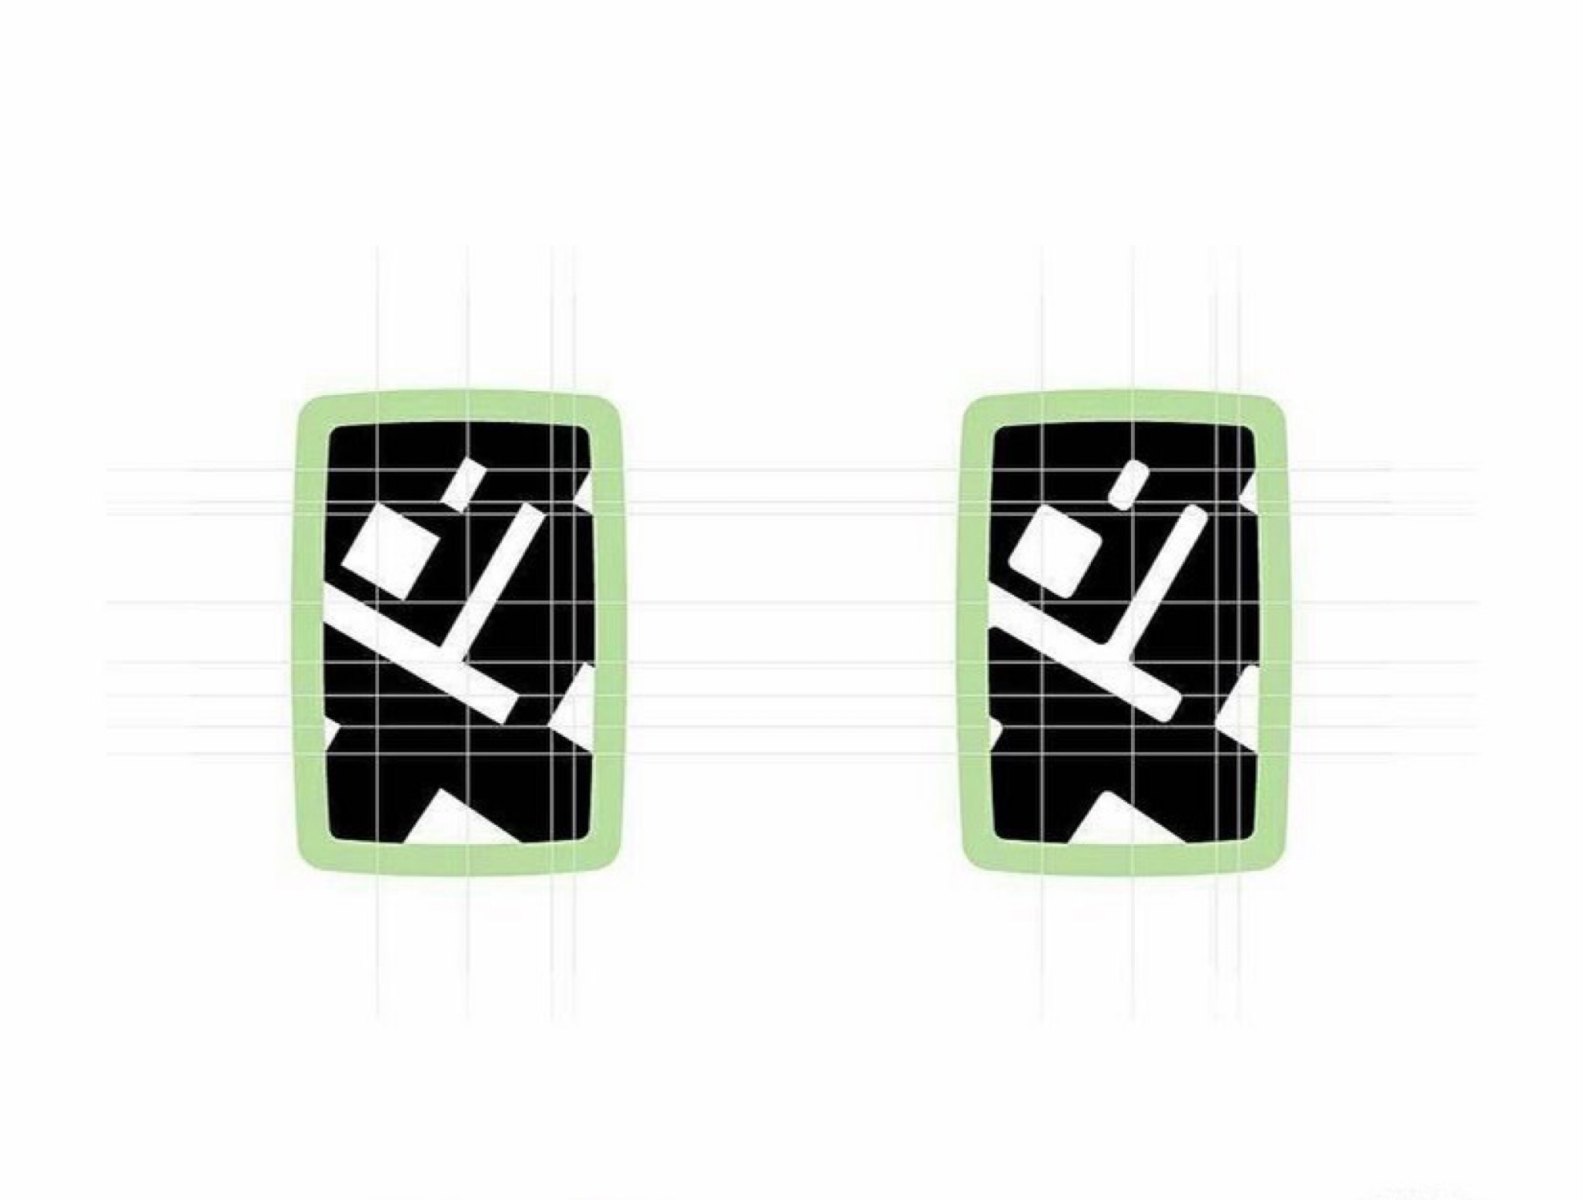 Logo Design marketing design webdesign شرکت طراحی سایت دکمه آژانس دیجیتال مارکتینگ دکمه dokmehdigitalmarketingagency uiux branding logo ui